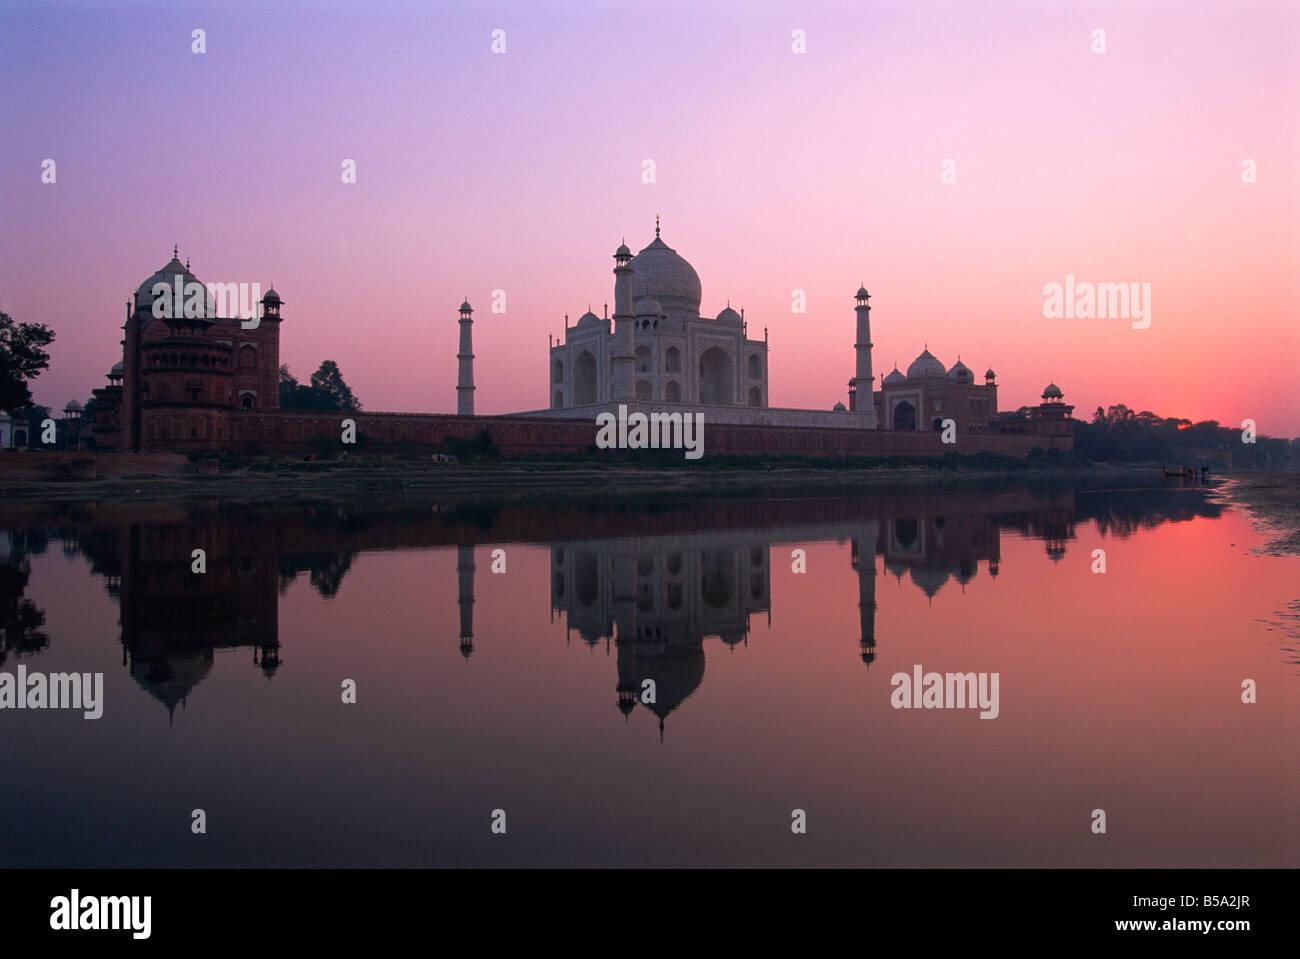 Taj Mahal at sunset UNESCO World Heritage Site Agra Uttar Pradesh state India Asia - Stock Image